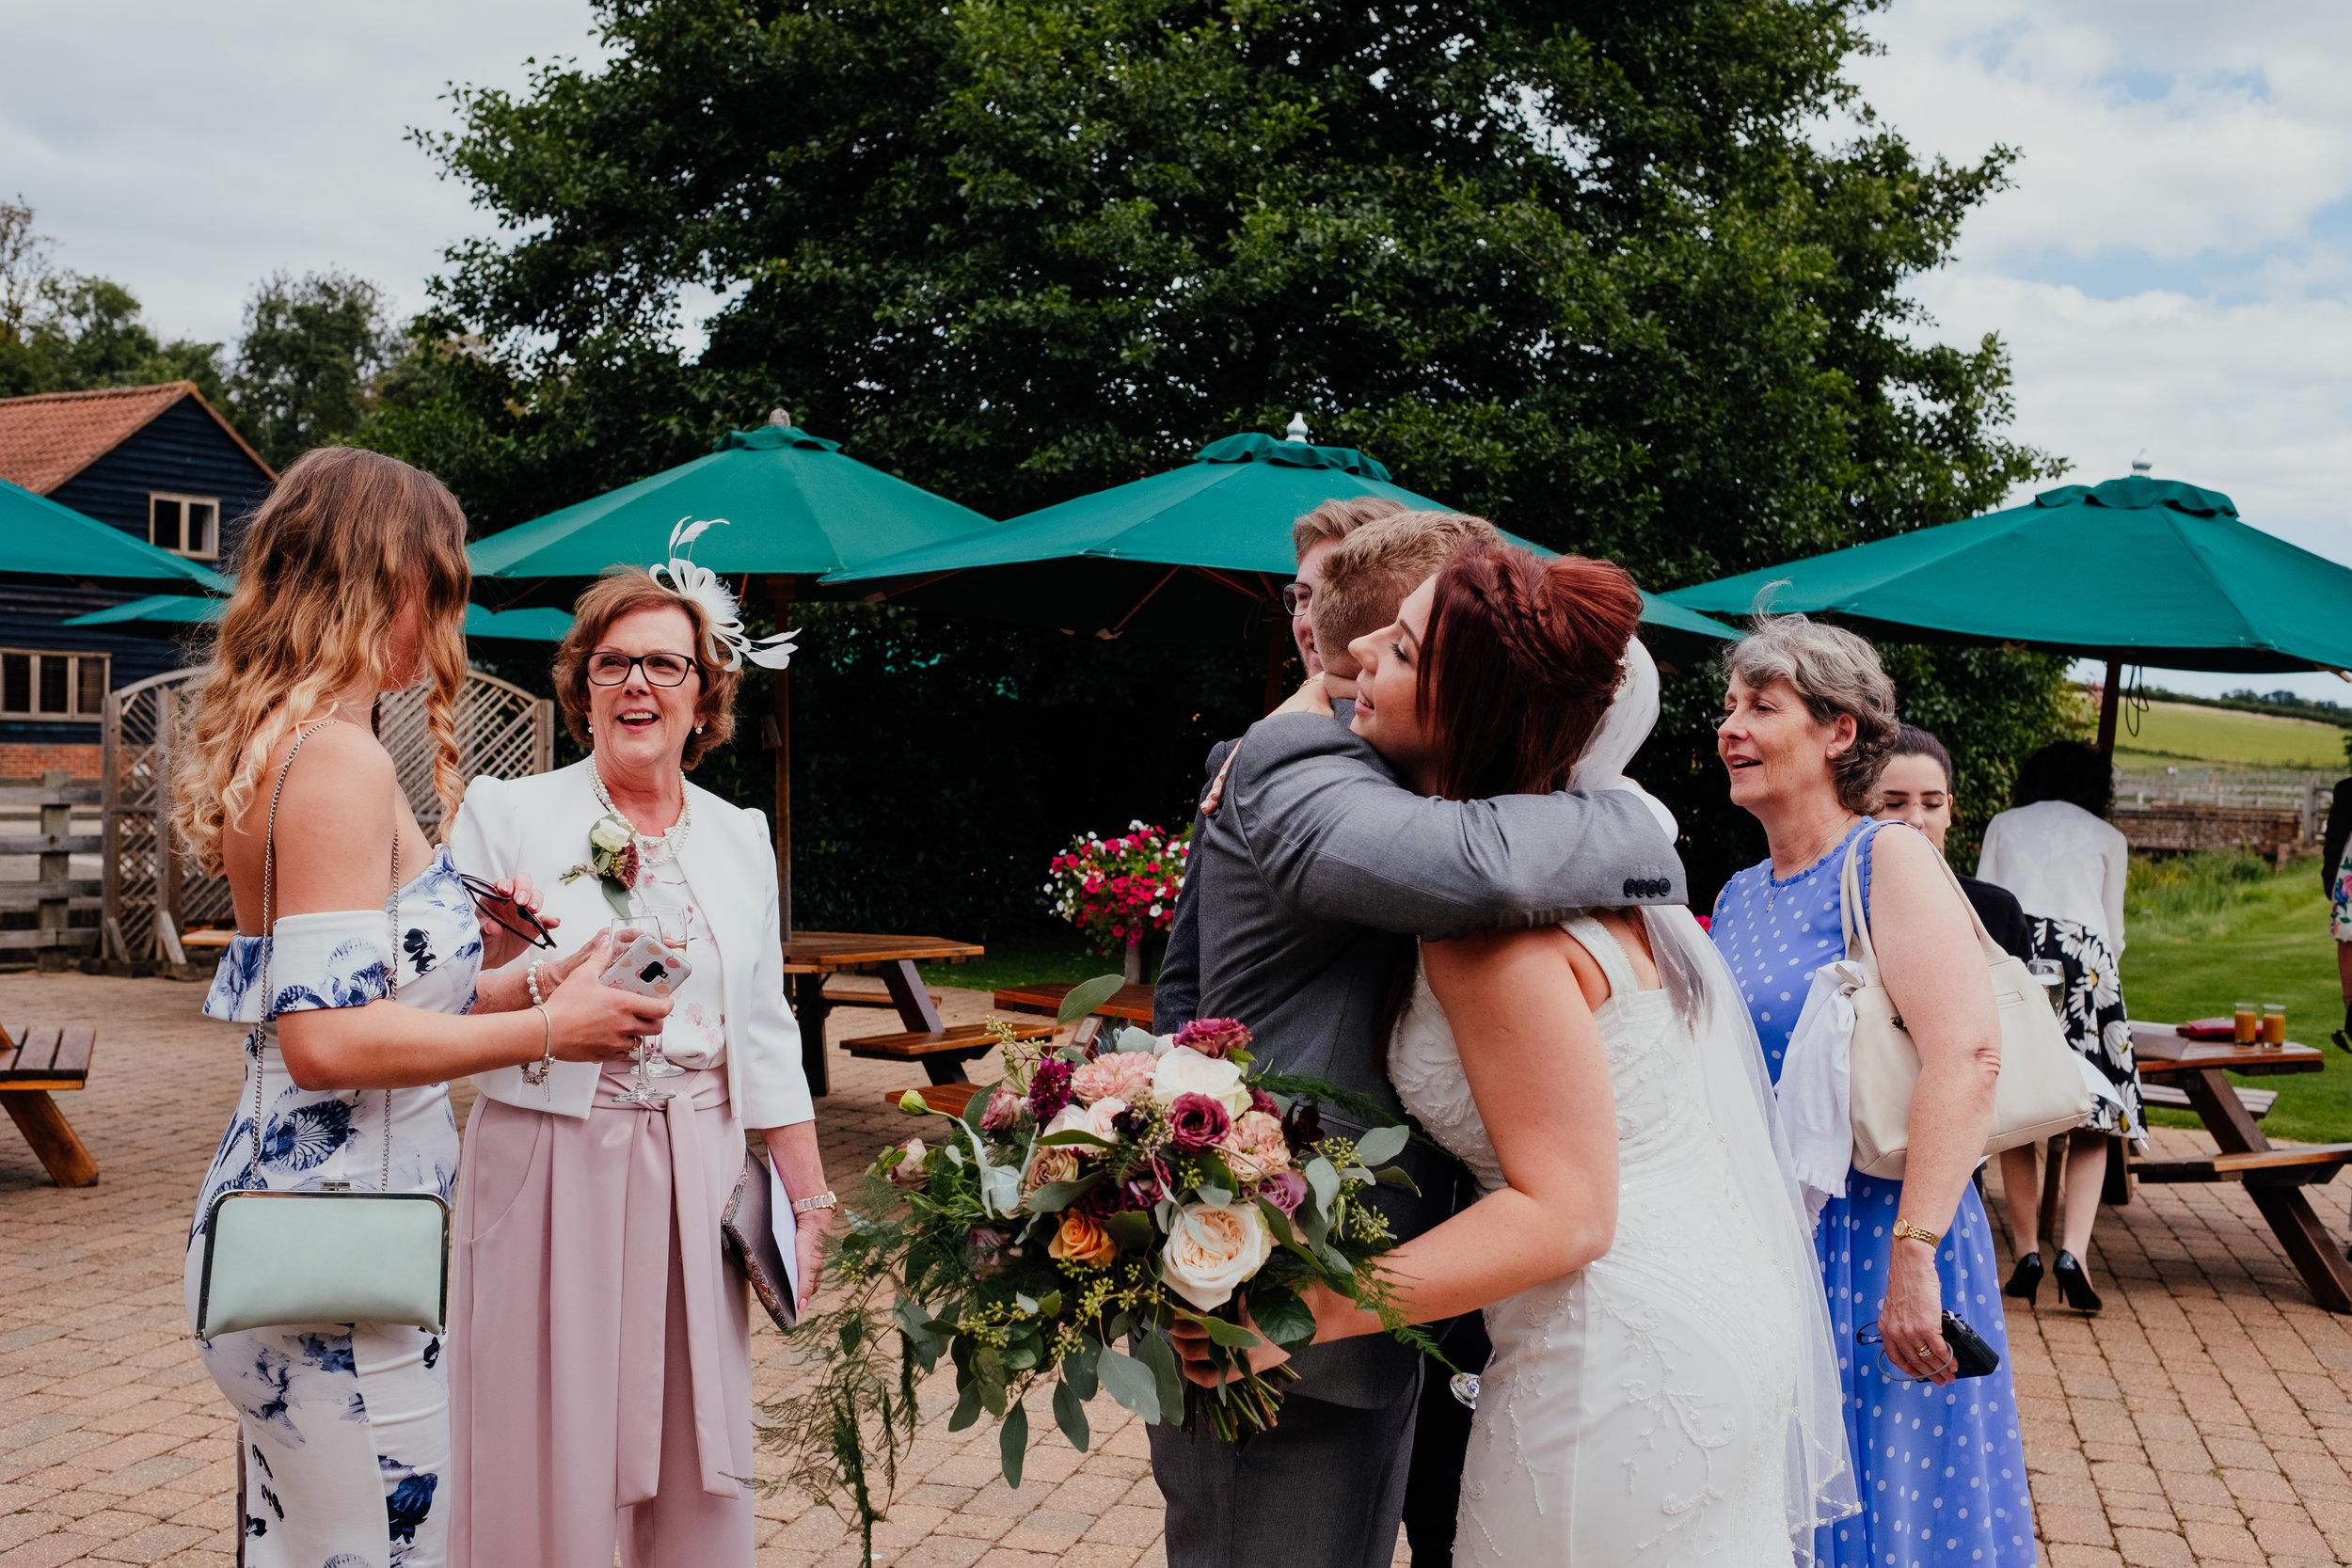 Bride hugs her brother after wedding ceremony